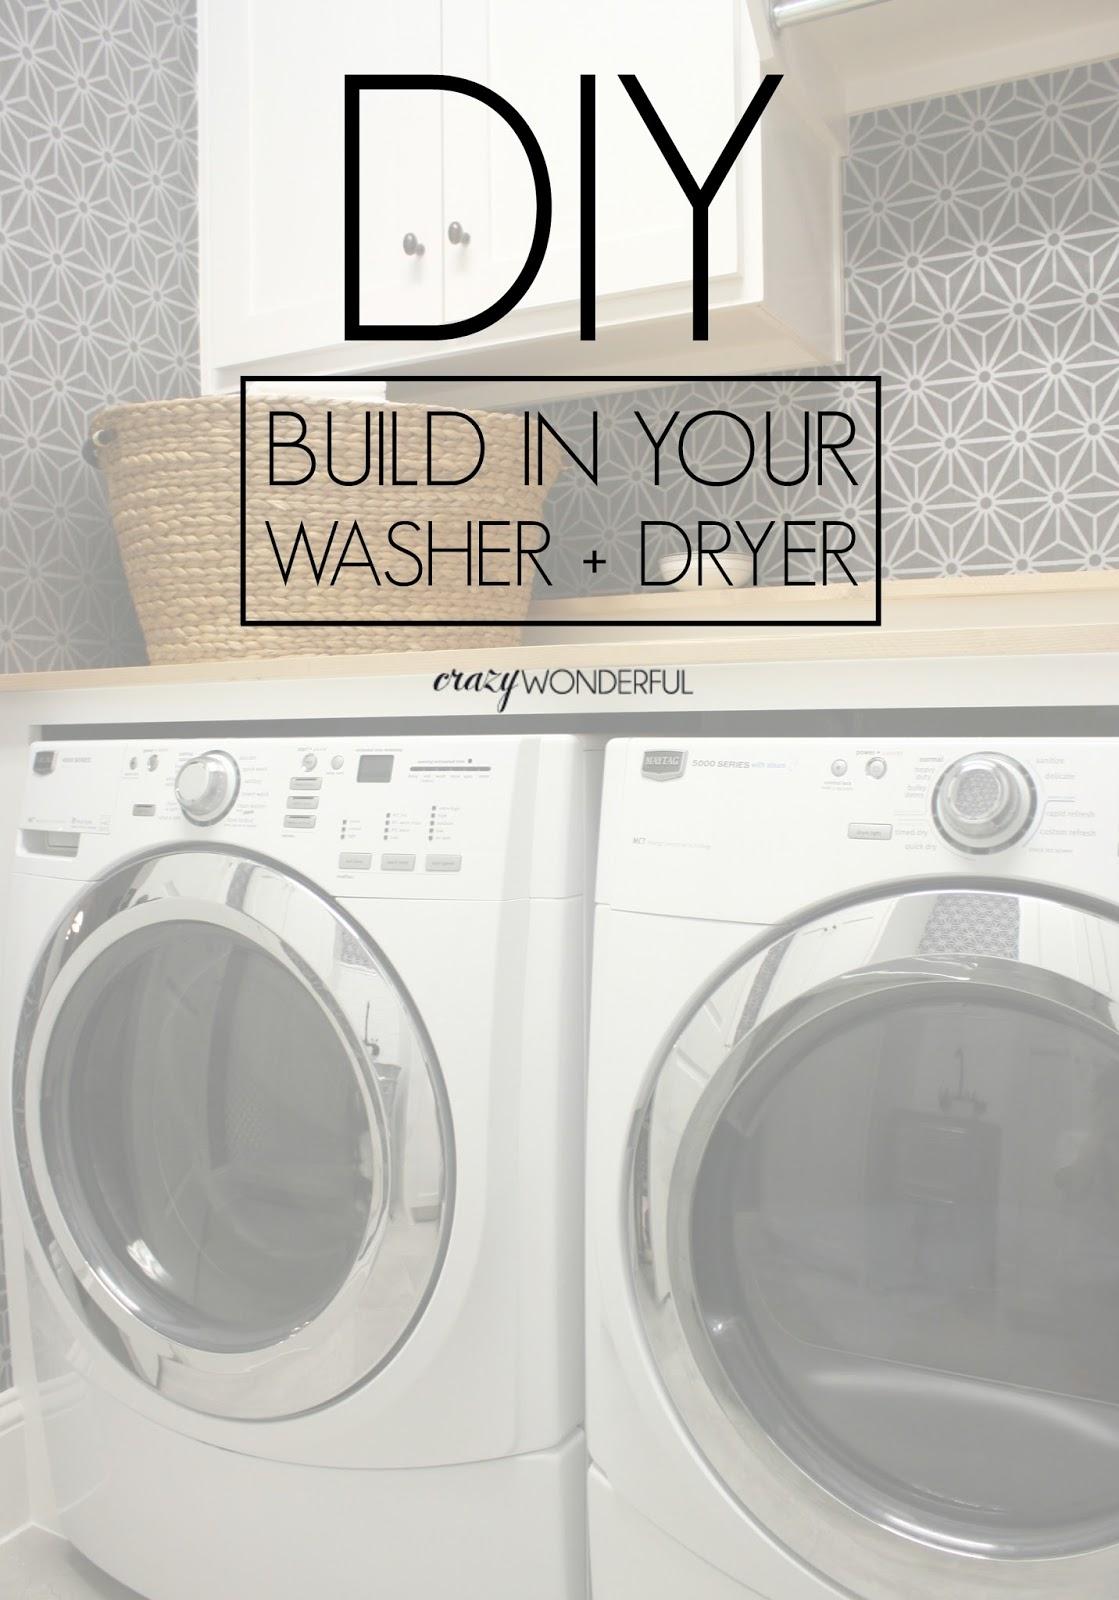 DIY Built In Washer + Dryer